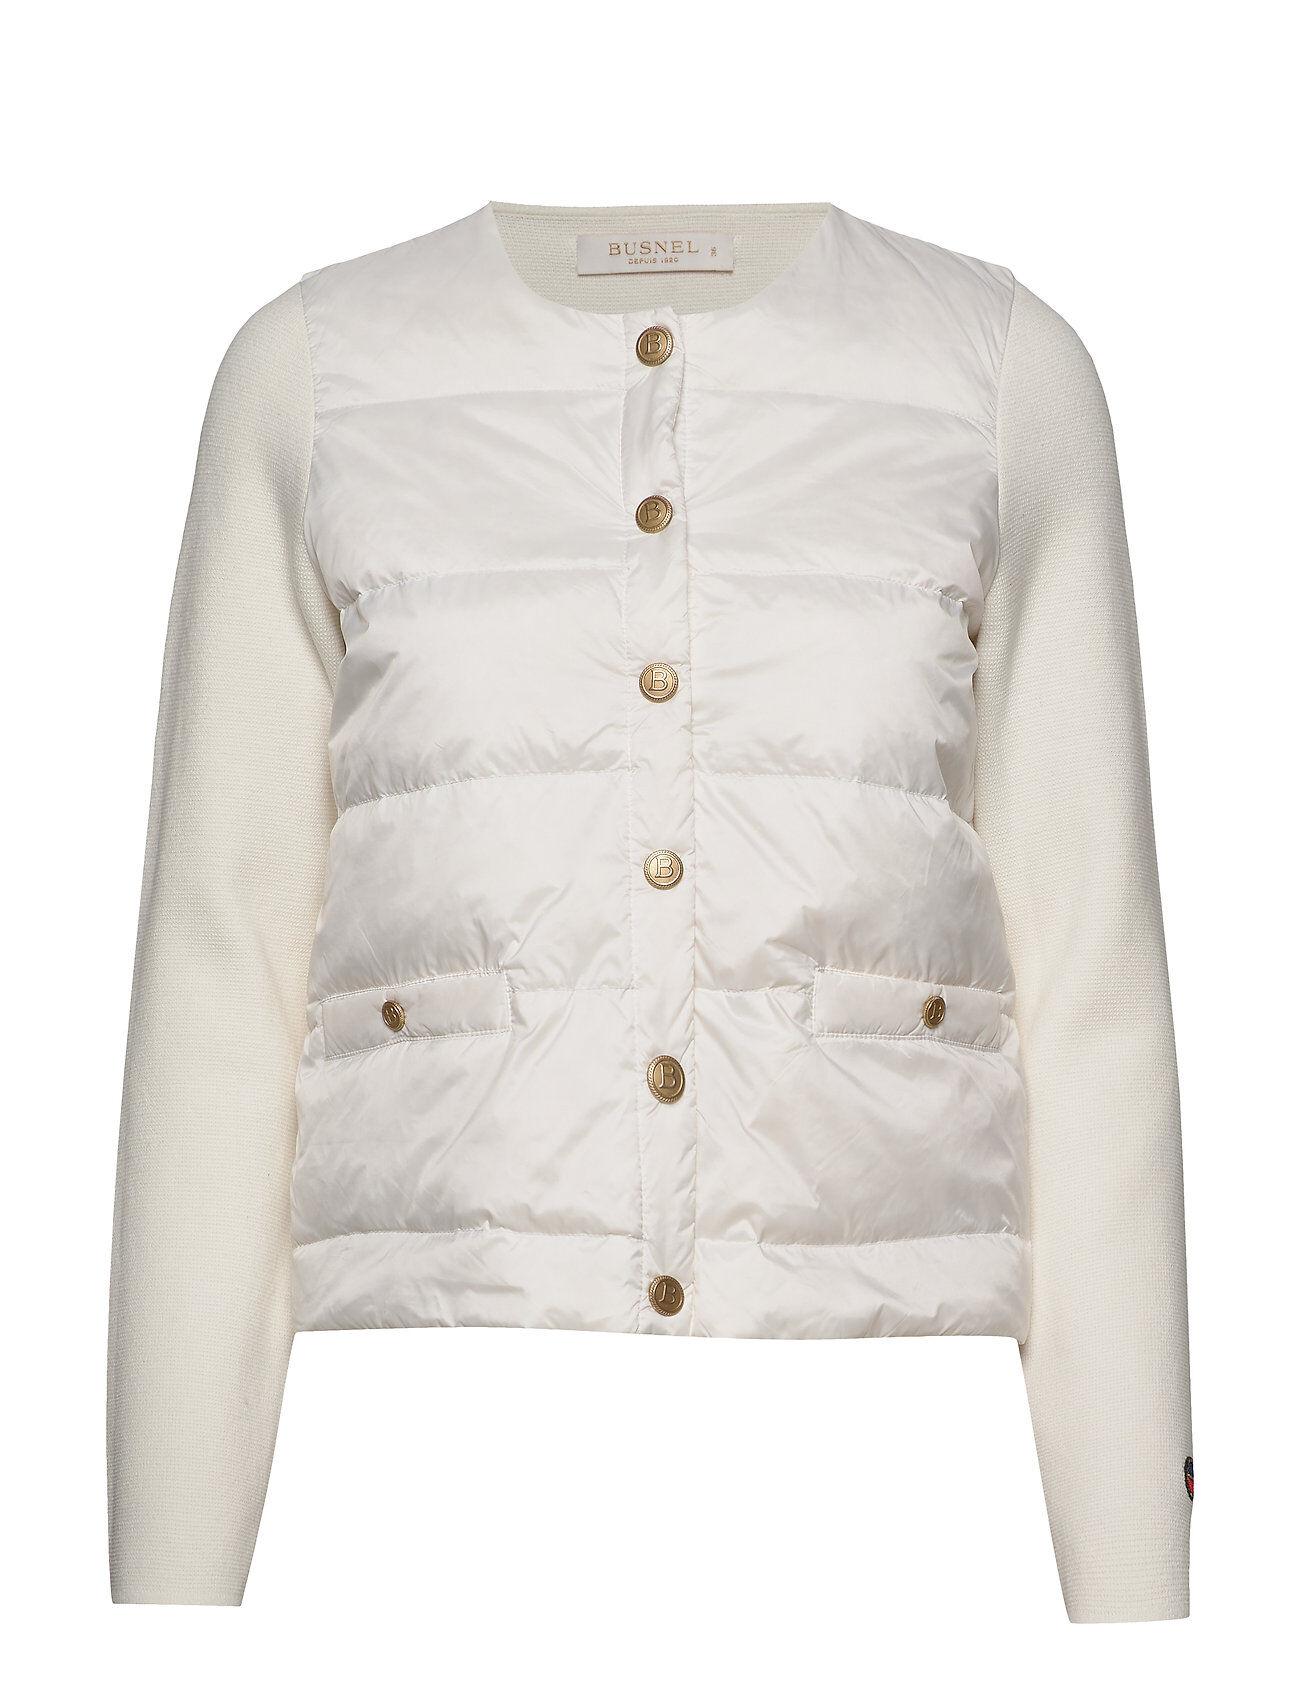 BUSNEL Inella Down Jacket Vuorillinen Takki Topattu Takki Valkoinen BUSNEL